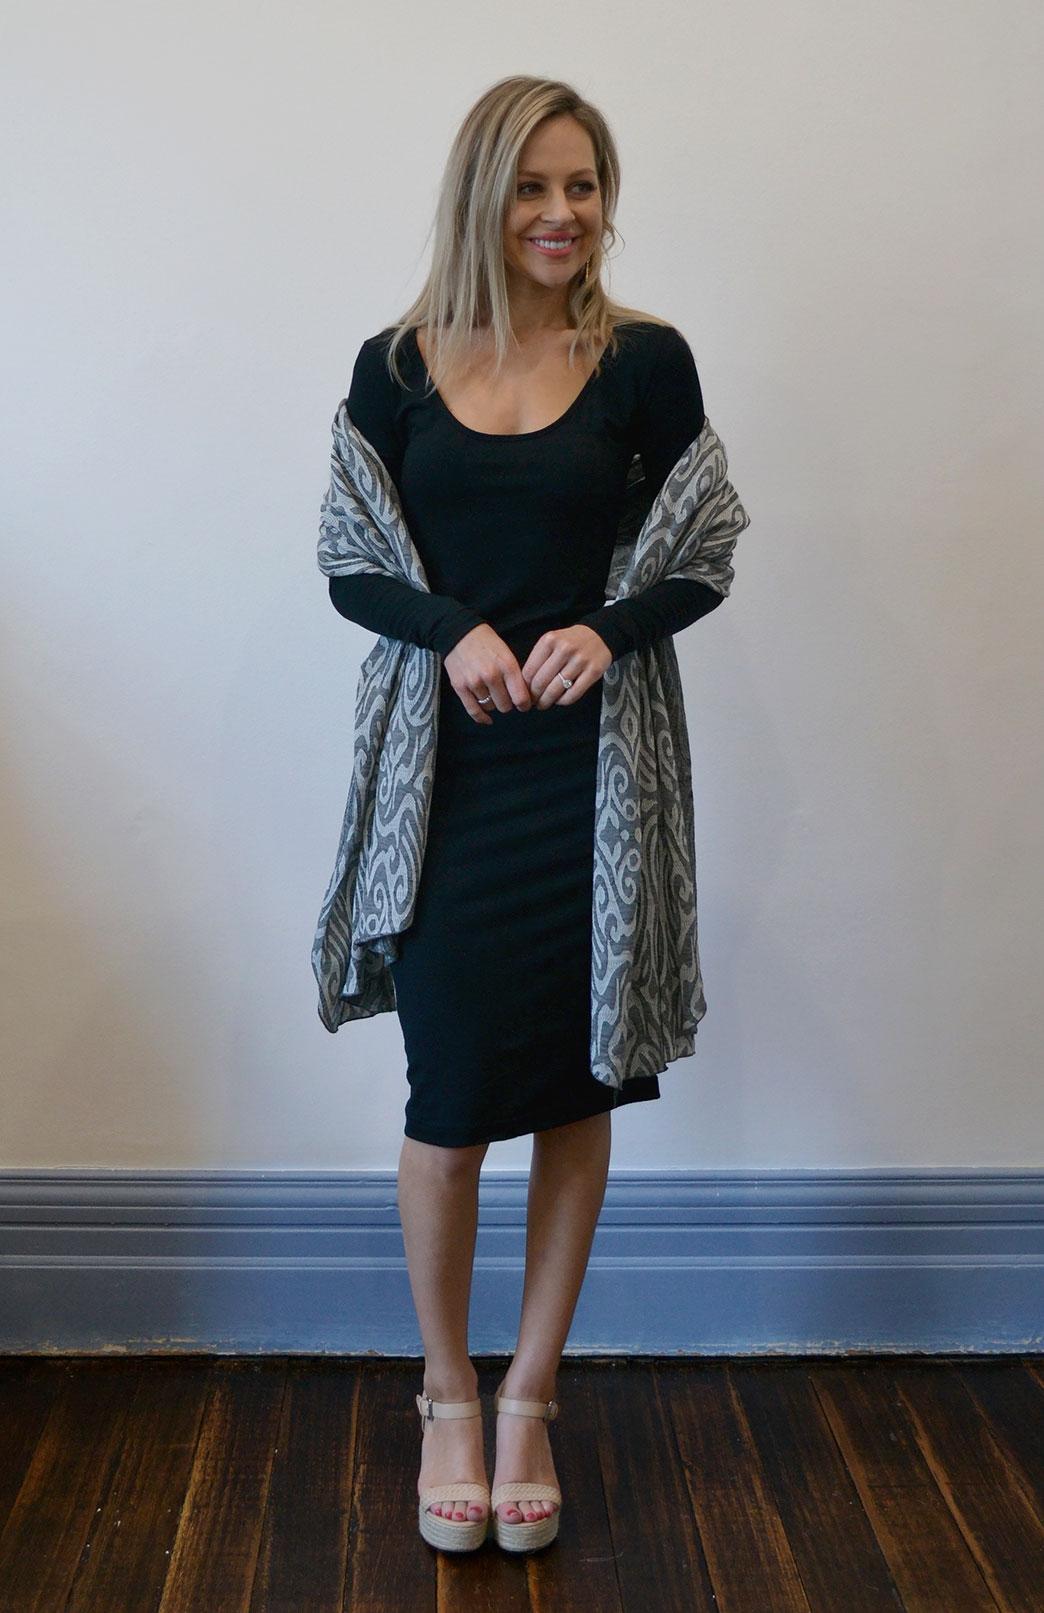 Scoop Neck Dress - Long Sleeve - Women's Black Long Sleeve Wool Fitted Scoop Dress - Smitten Merino Tasmania Australia